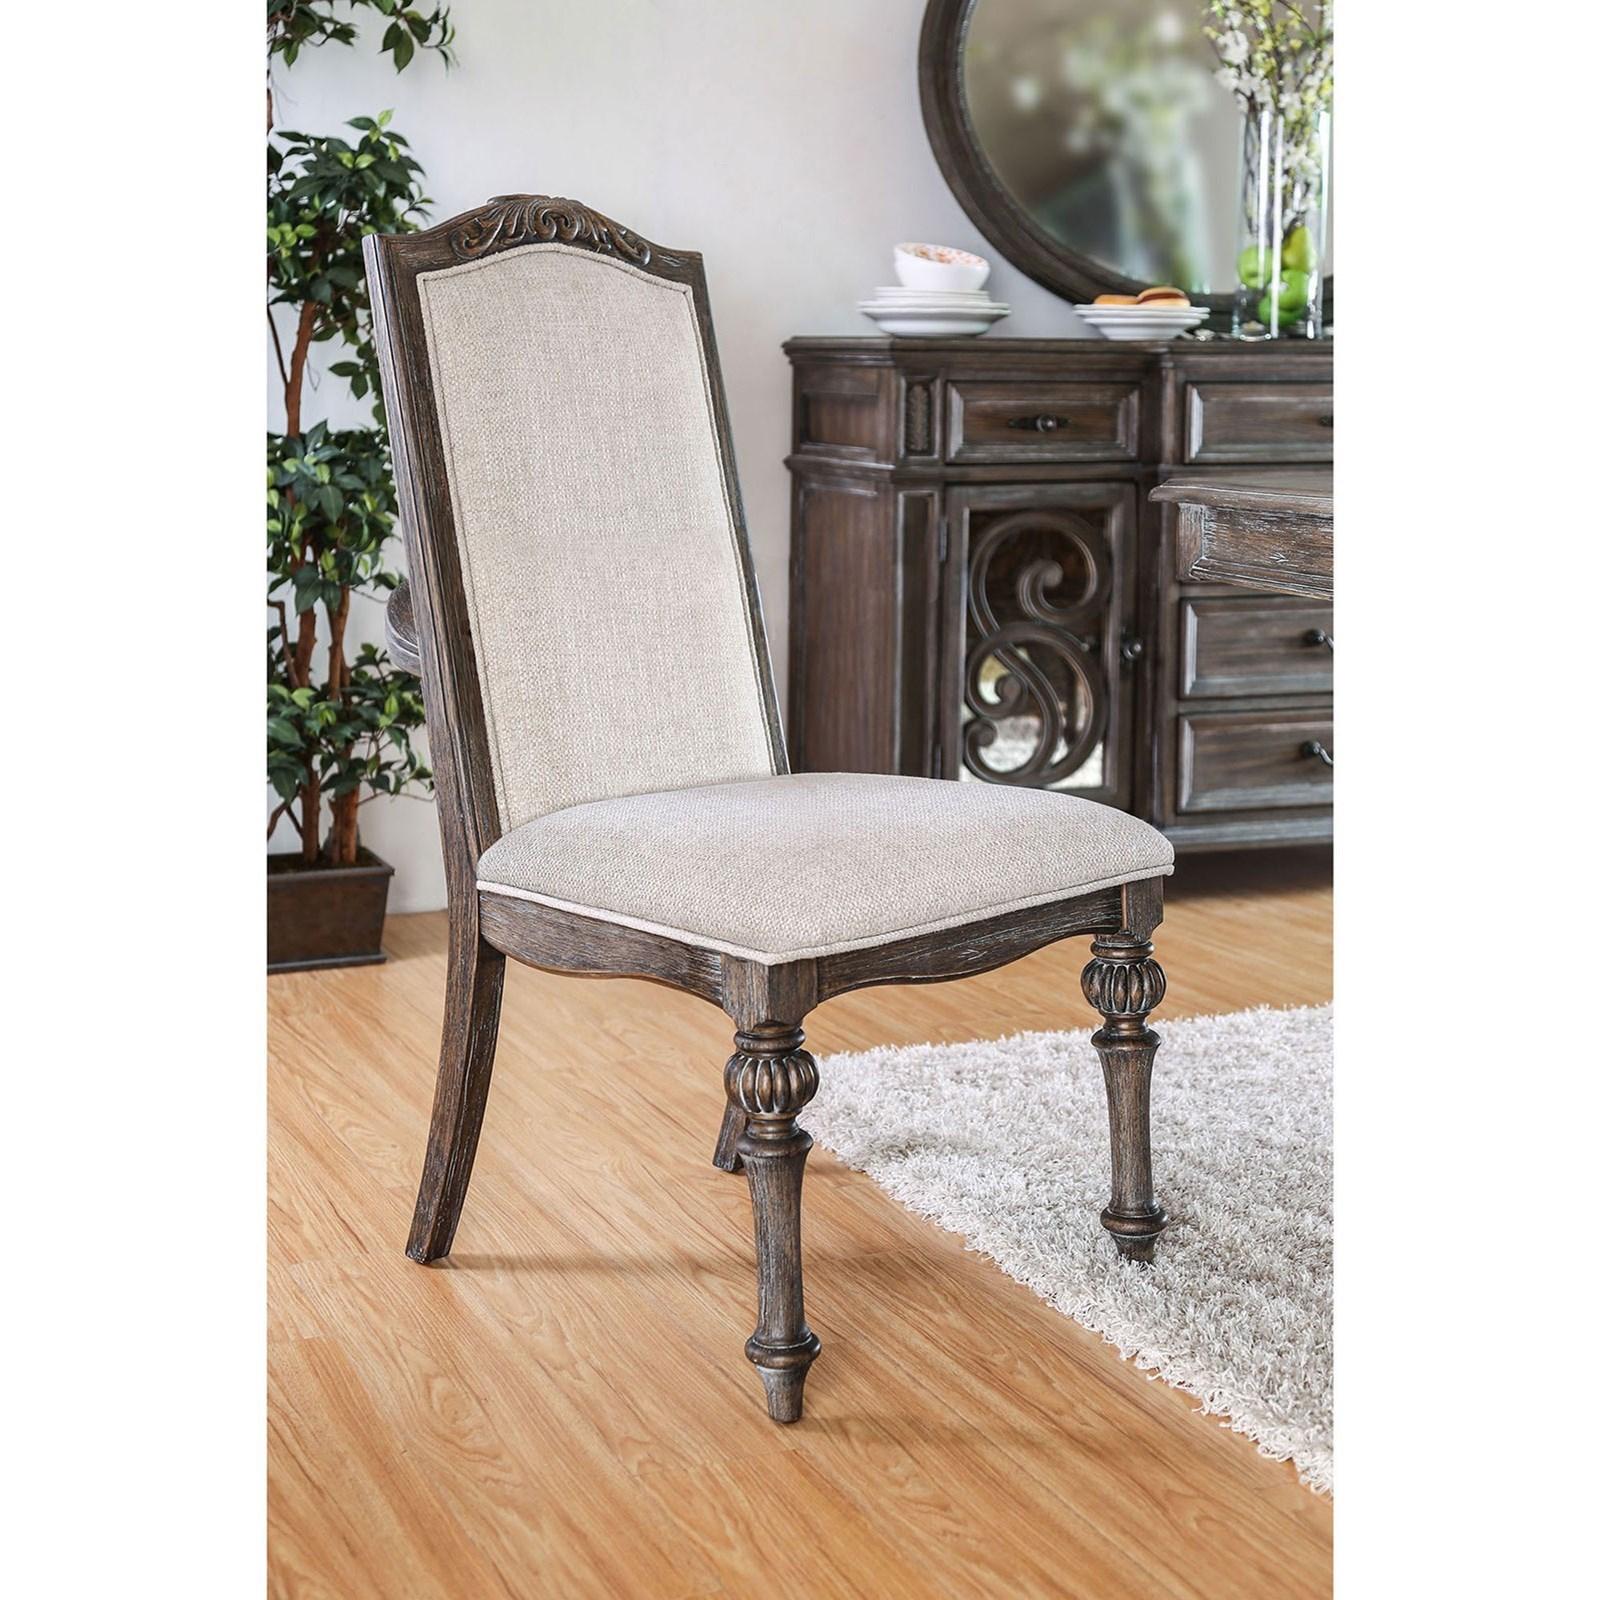 Ashley Furniture Arcadia: America Arcadia CM3150T-9PC 9 Piece Traditional Dining Set